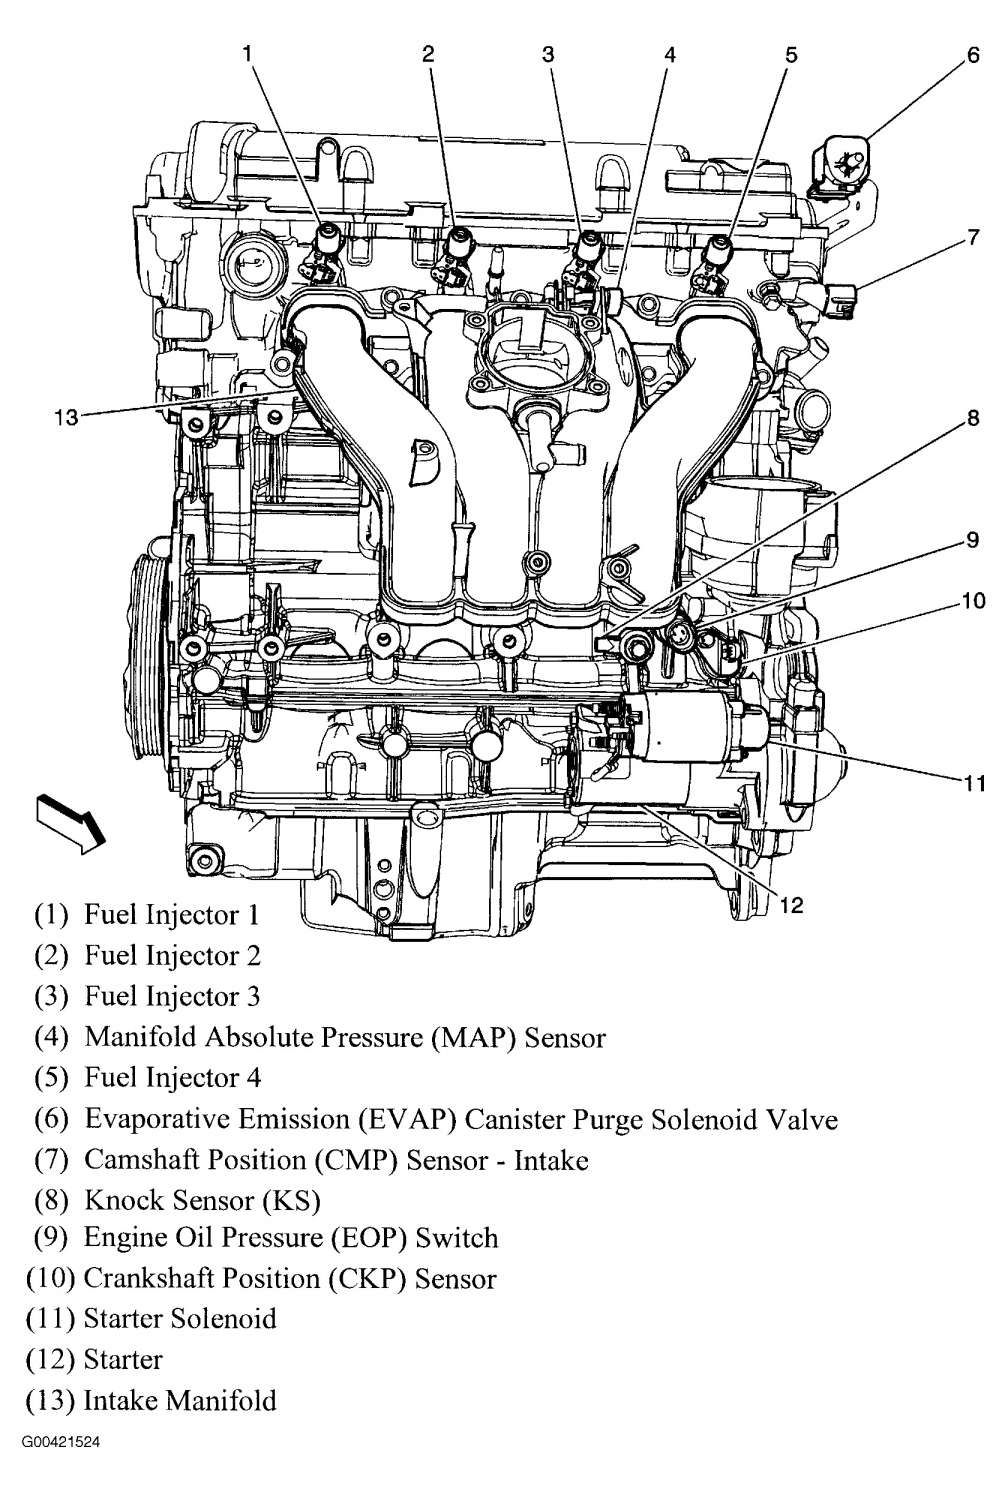 DIAGRAM] 2003 Pontiac Aztek Starter Wiring Diagram FULL Version HD Quality Wiring  Diagram - WILSONDATABASE.CONSERVATOIRE-CHANTERIE.FRwilsondatabase.conservatoire-chanterie.fr